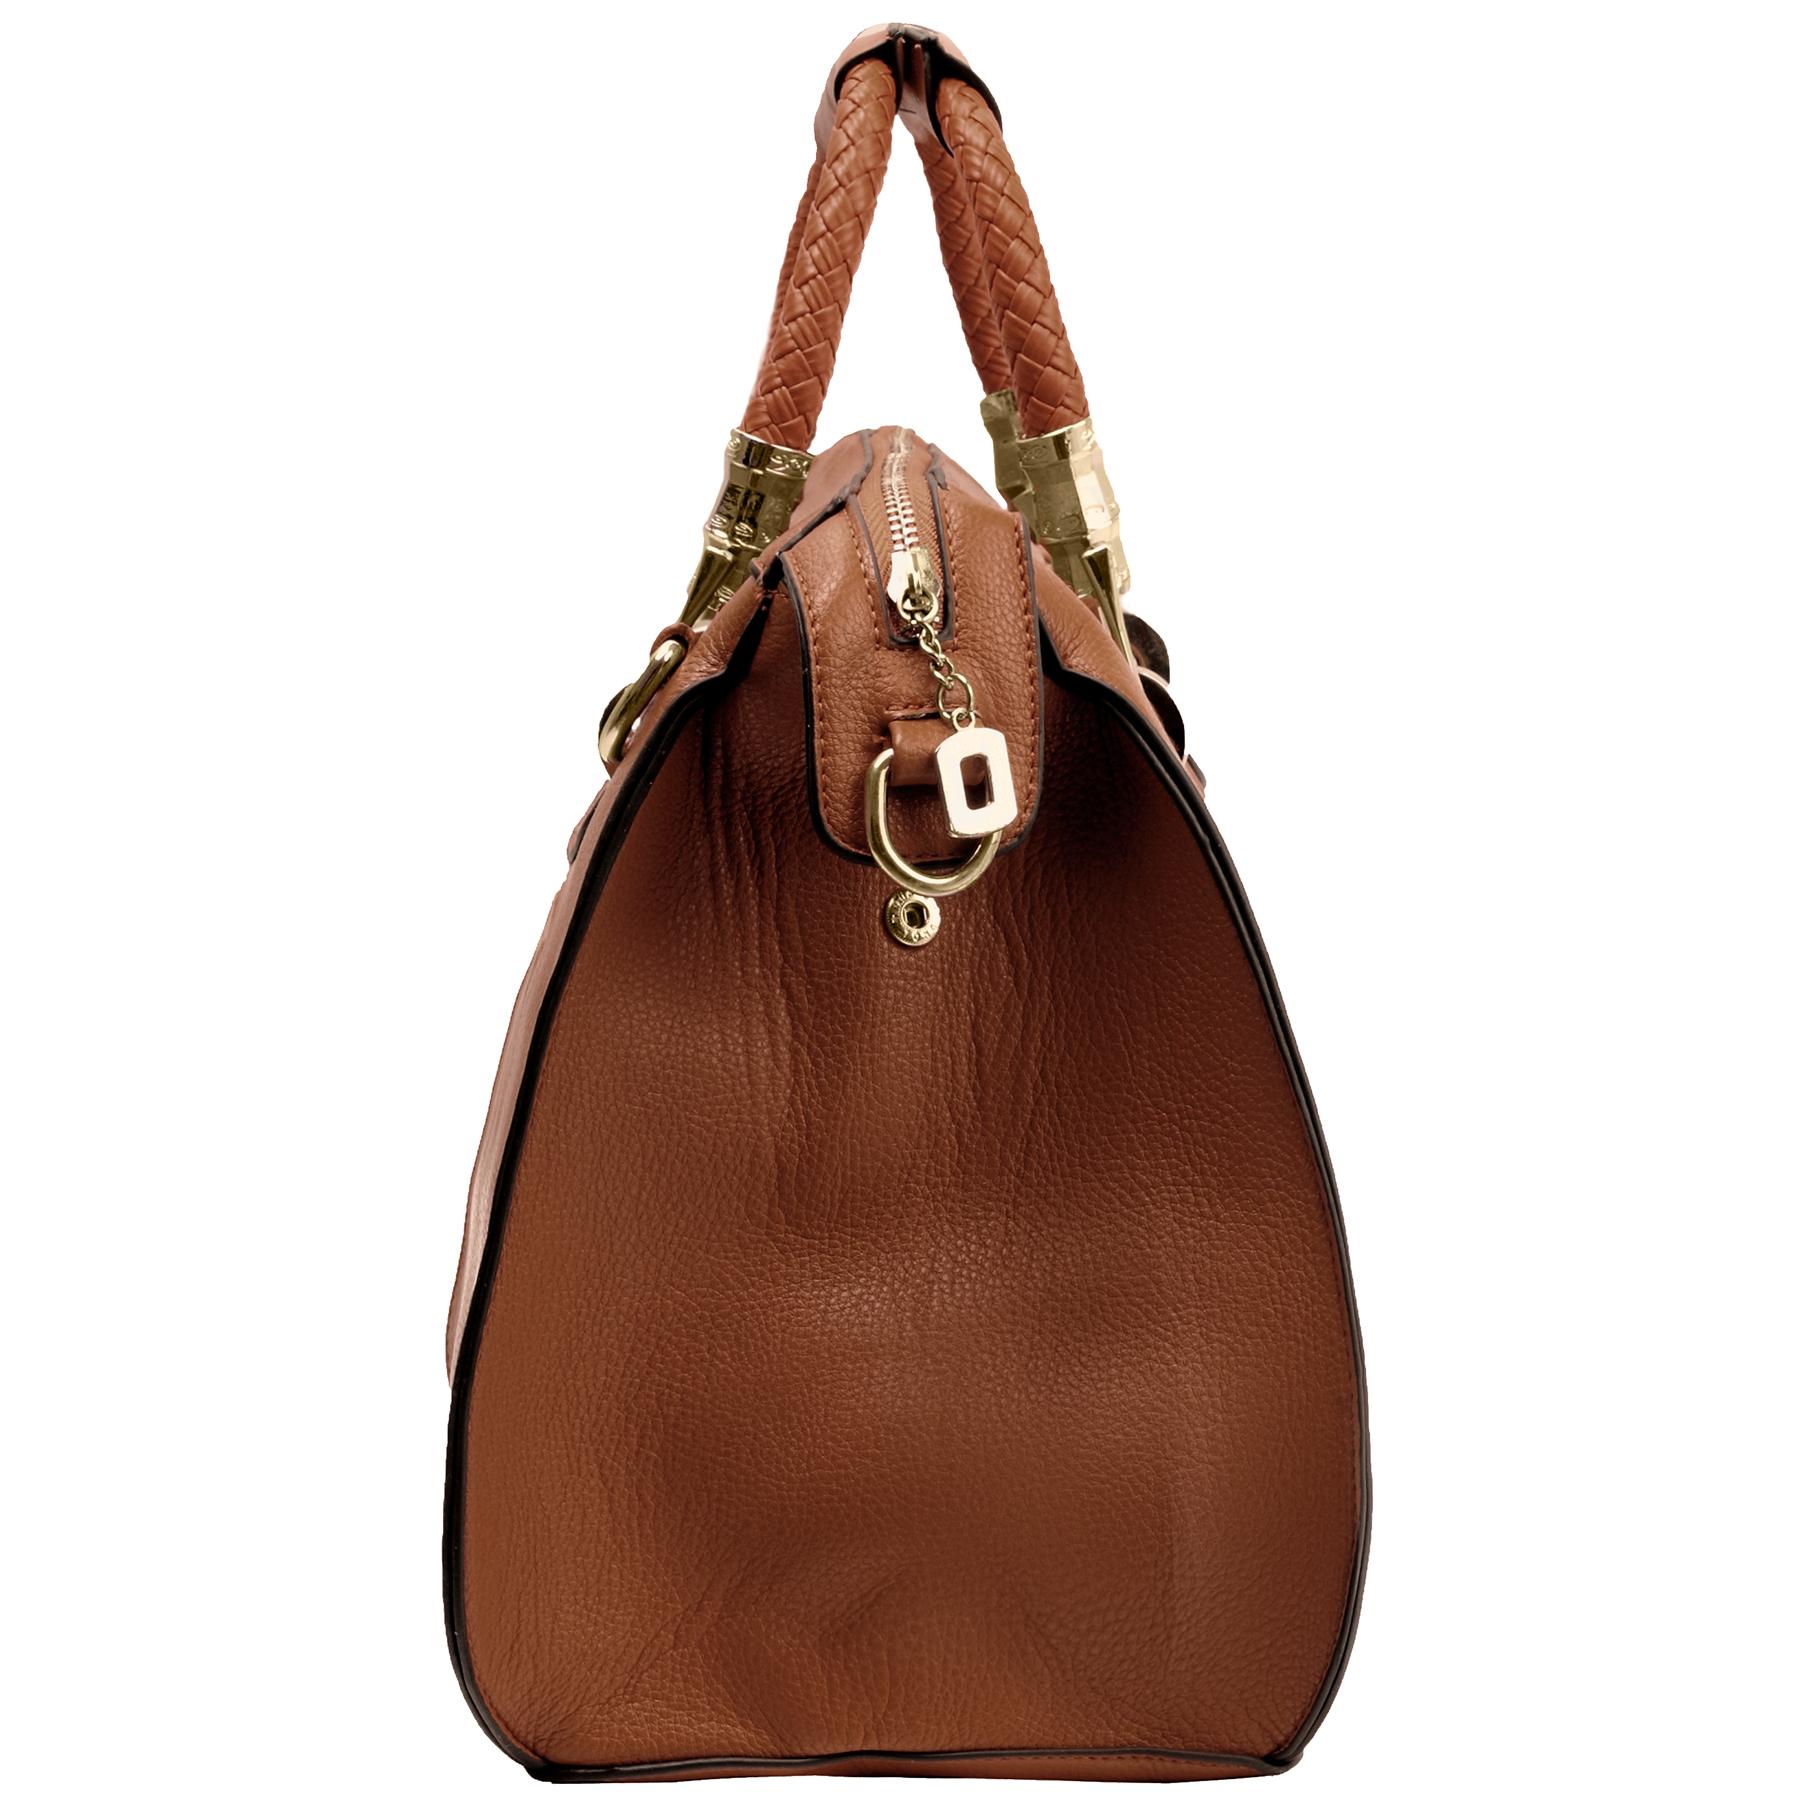 MARISSA Brown Doctor Style Handbag Side